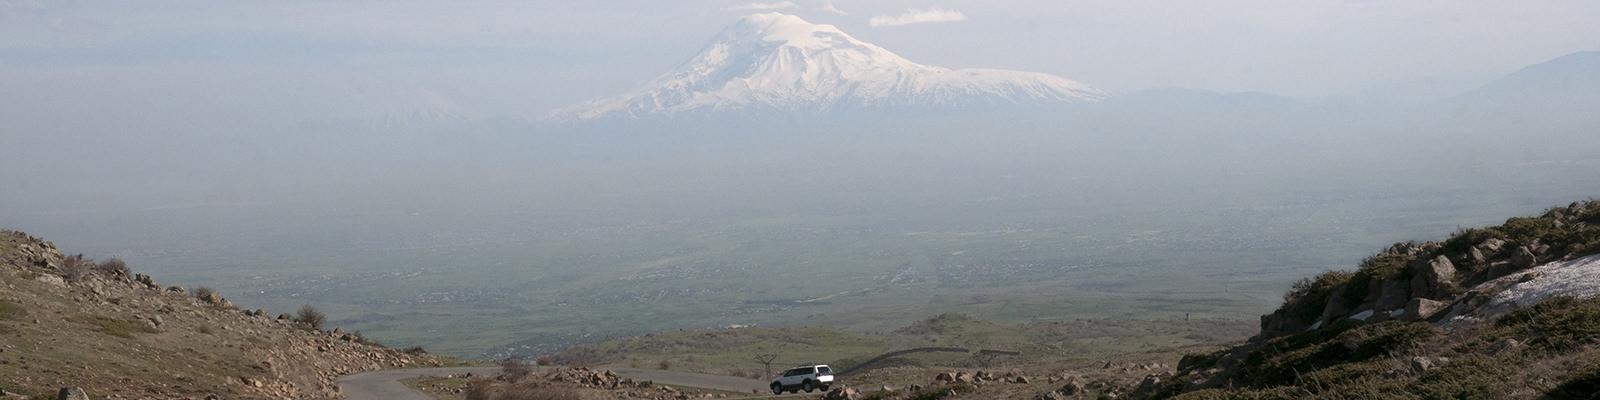 Aragats Mountain, Armenia